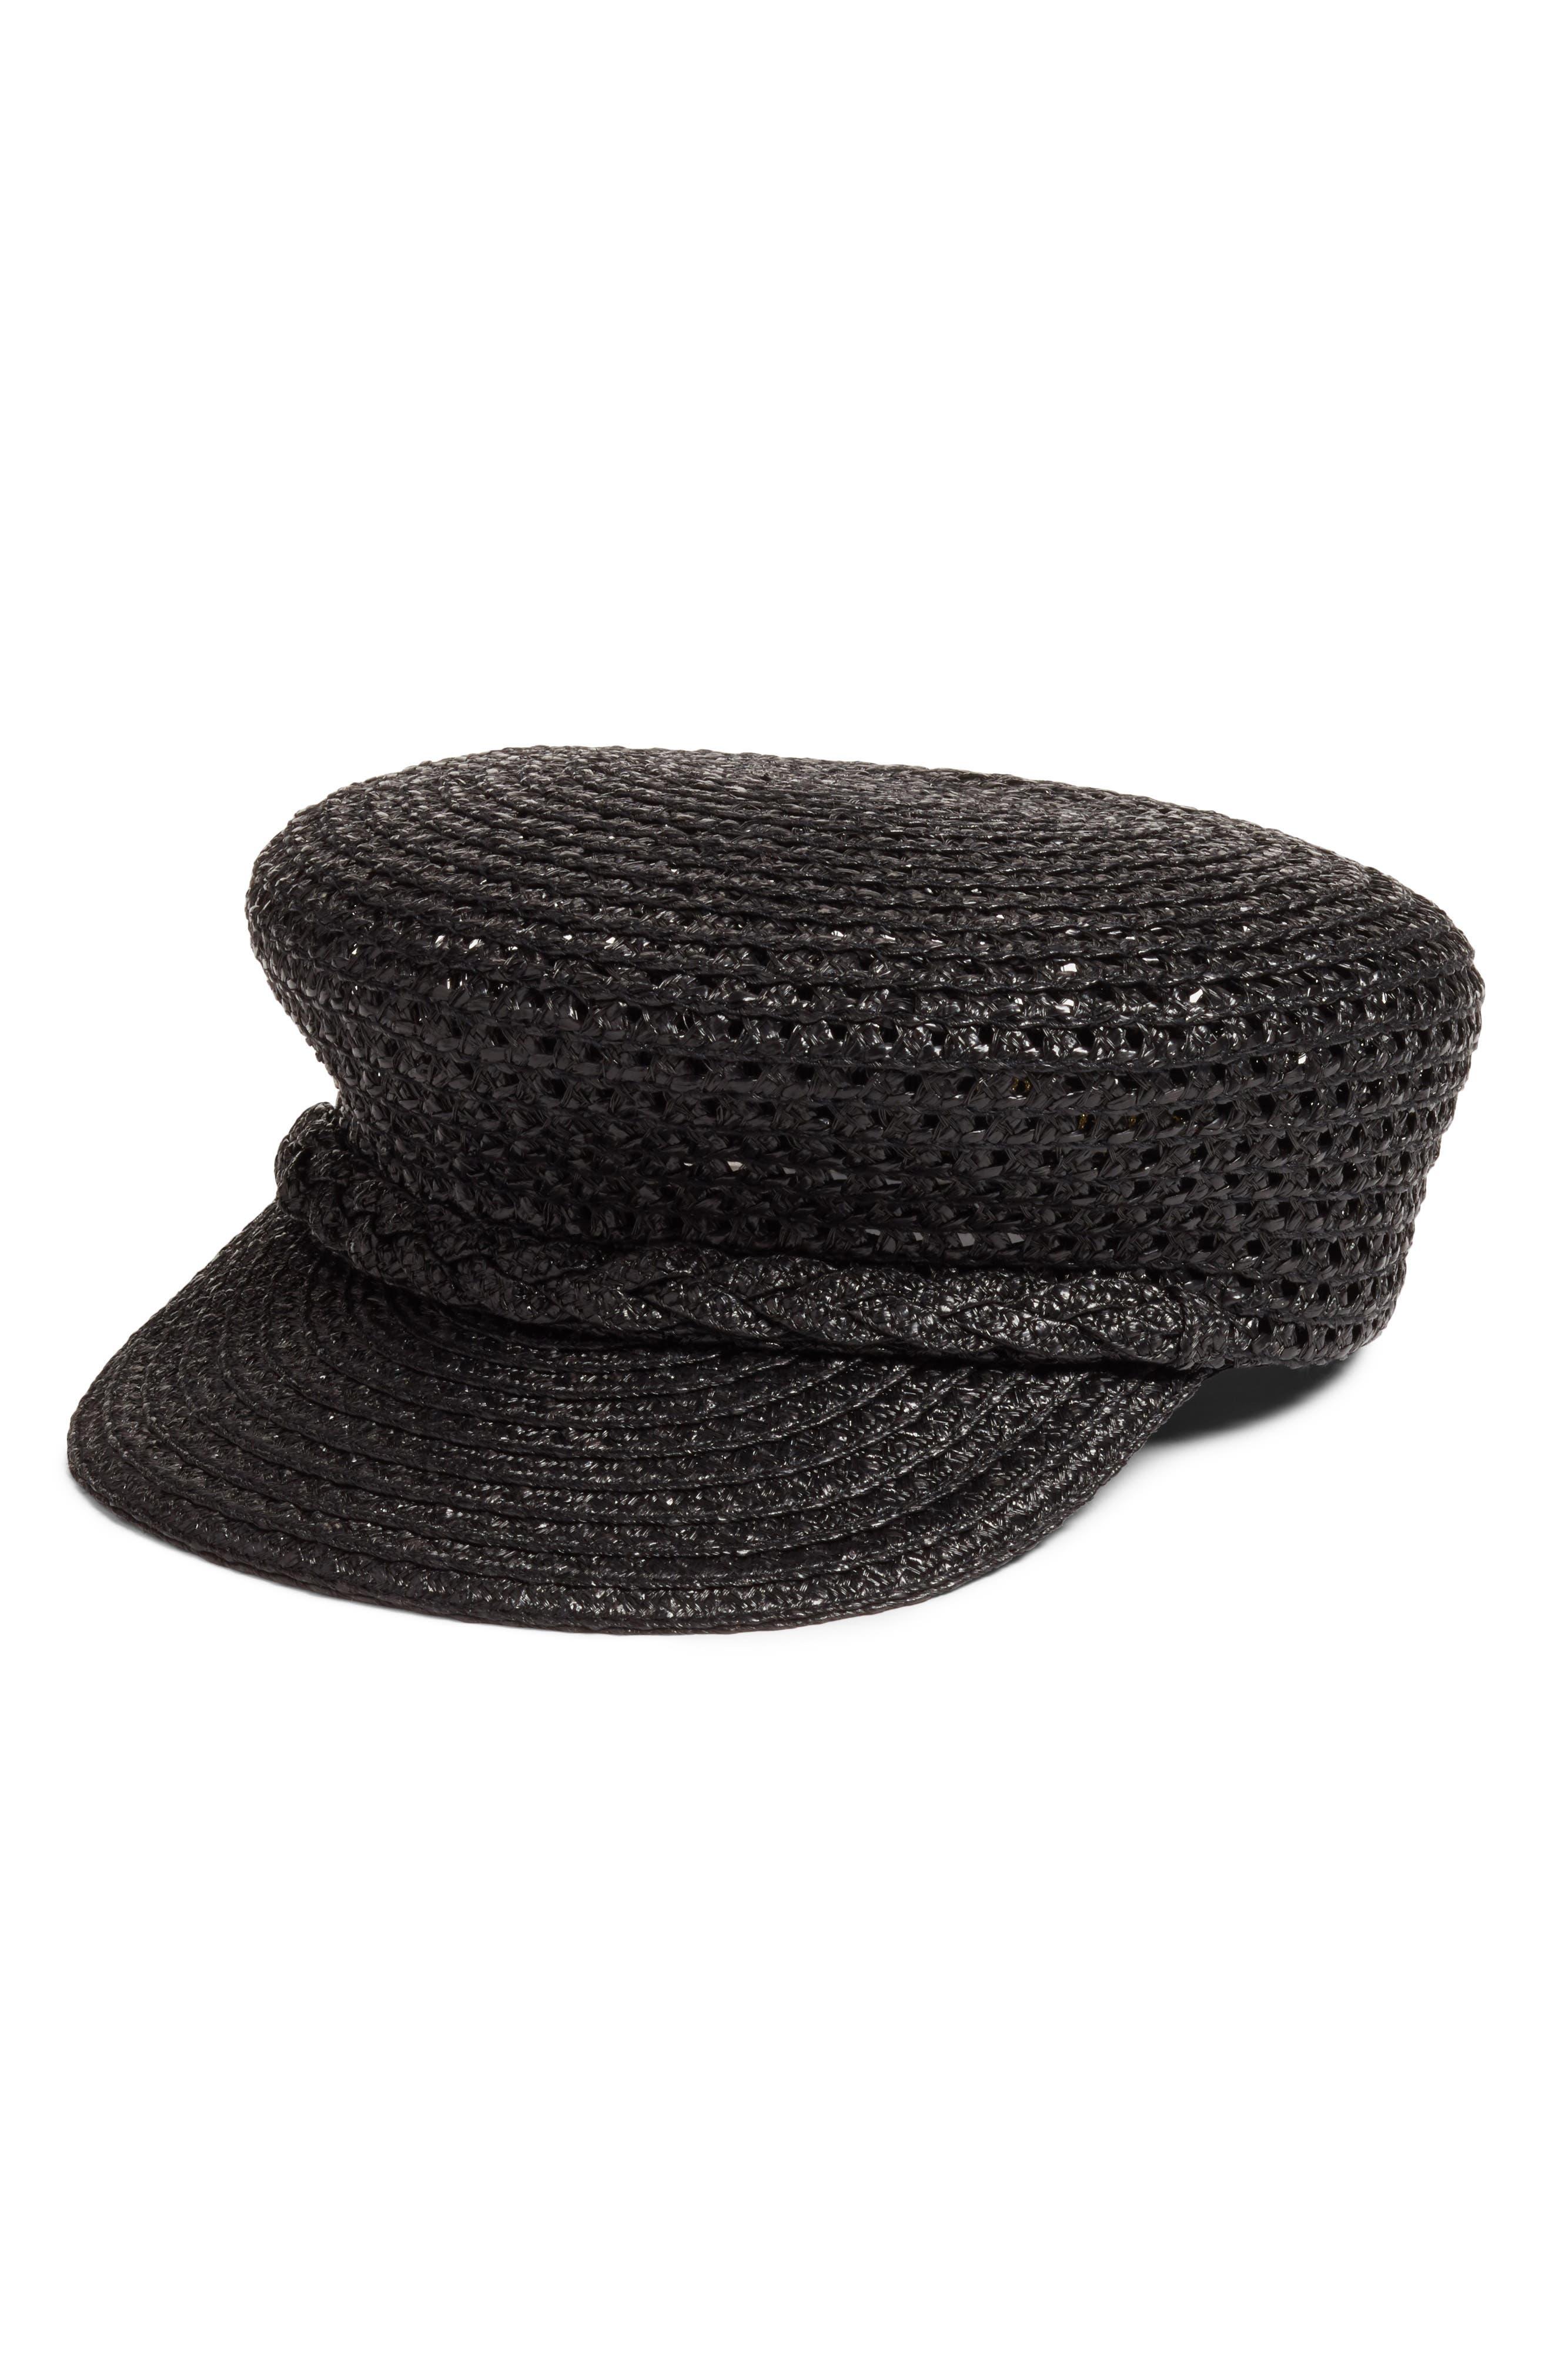 Capitan Squishee<sup>®</sup> Cap,                         Main,                         color, BLACK